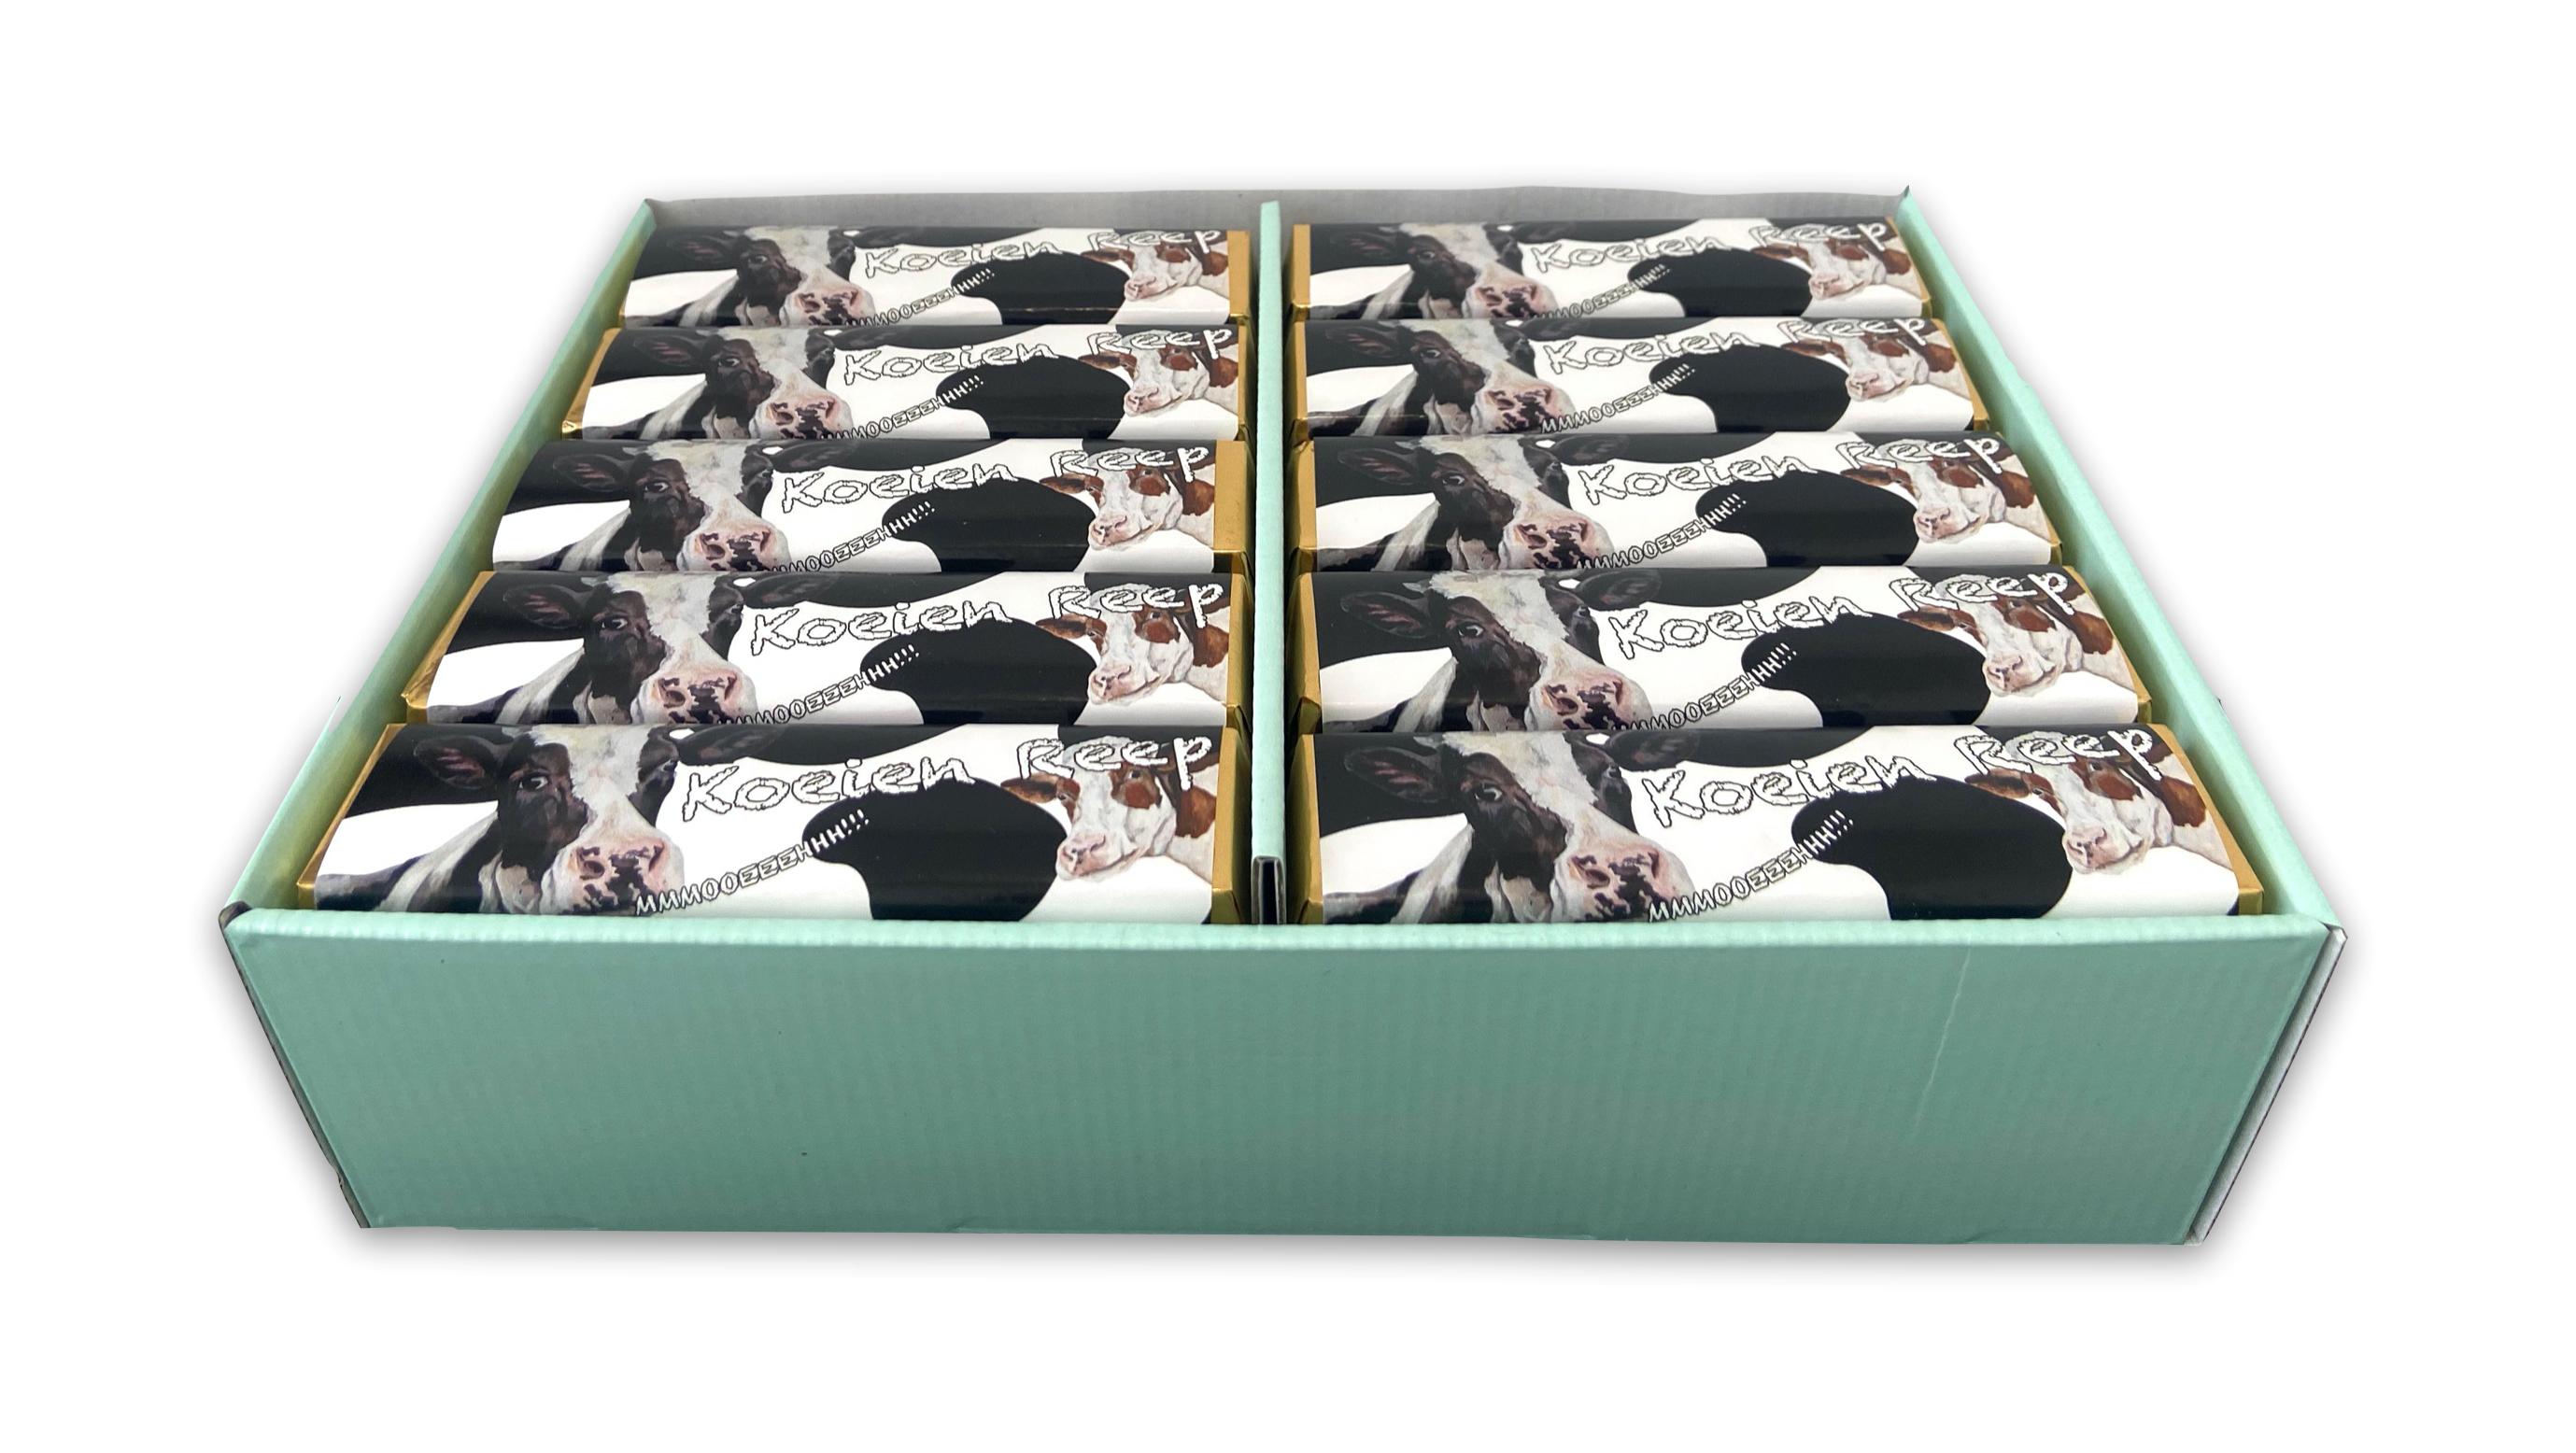 JanBax boerderij lekkernij koeienreep chocolade [displaydoos 40 repen]